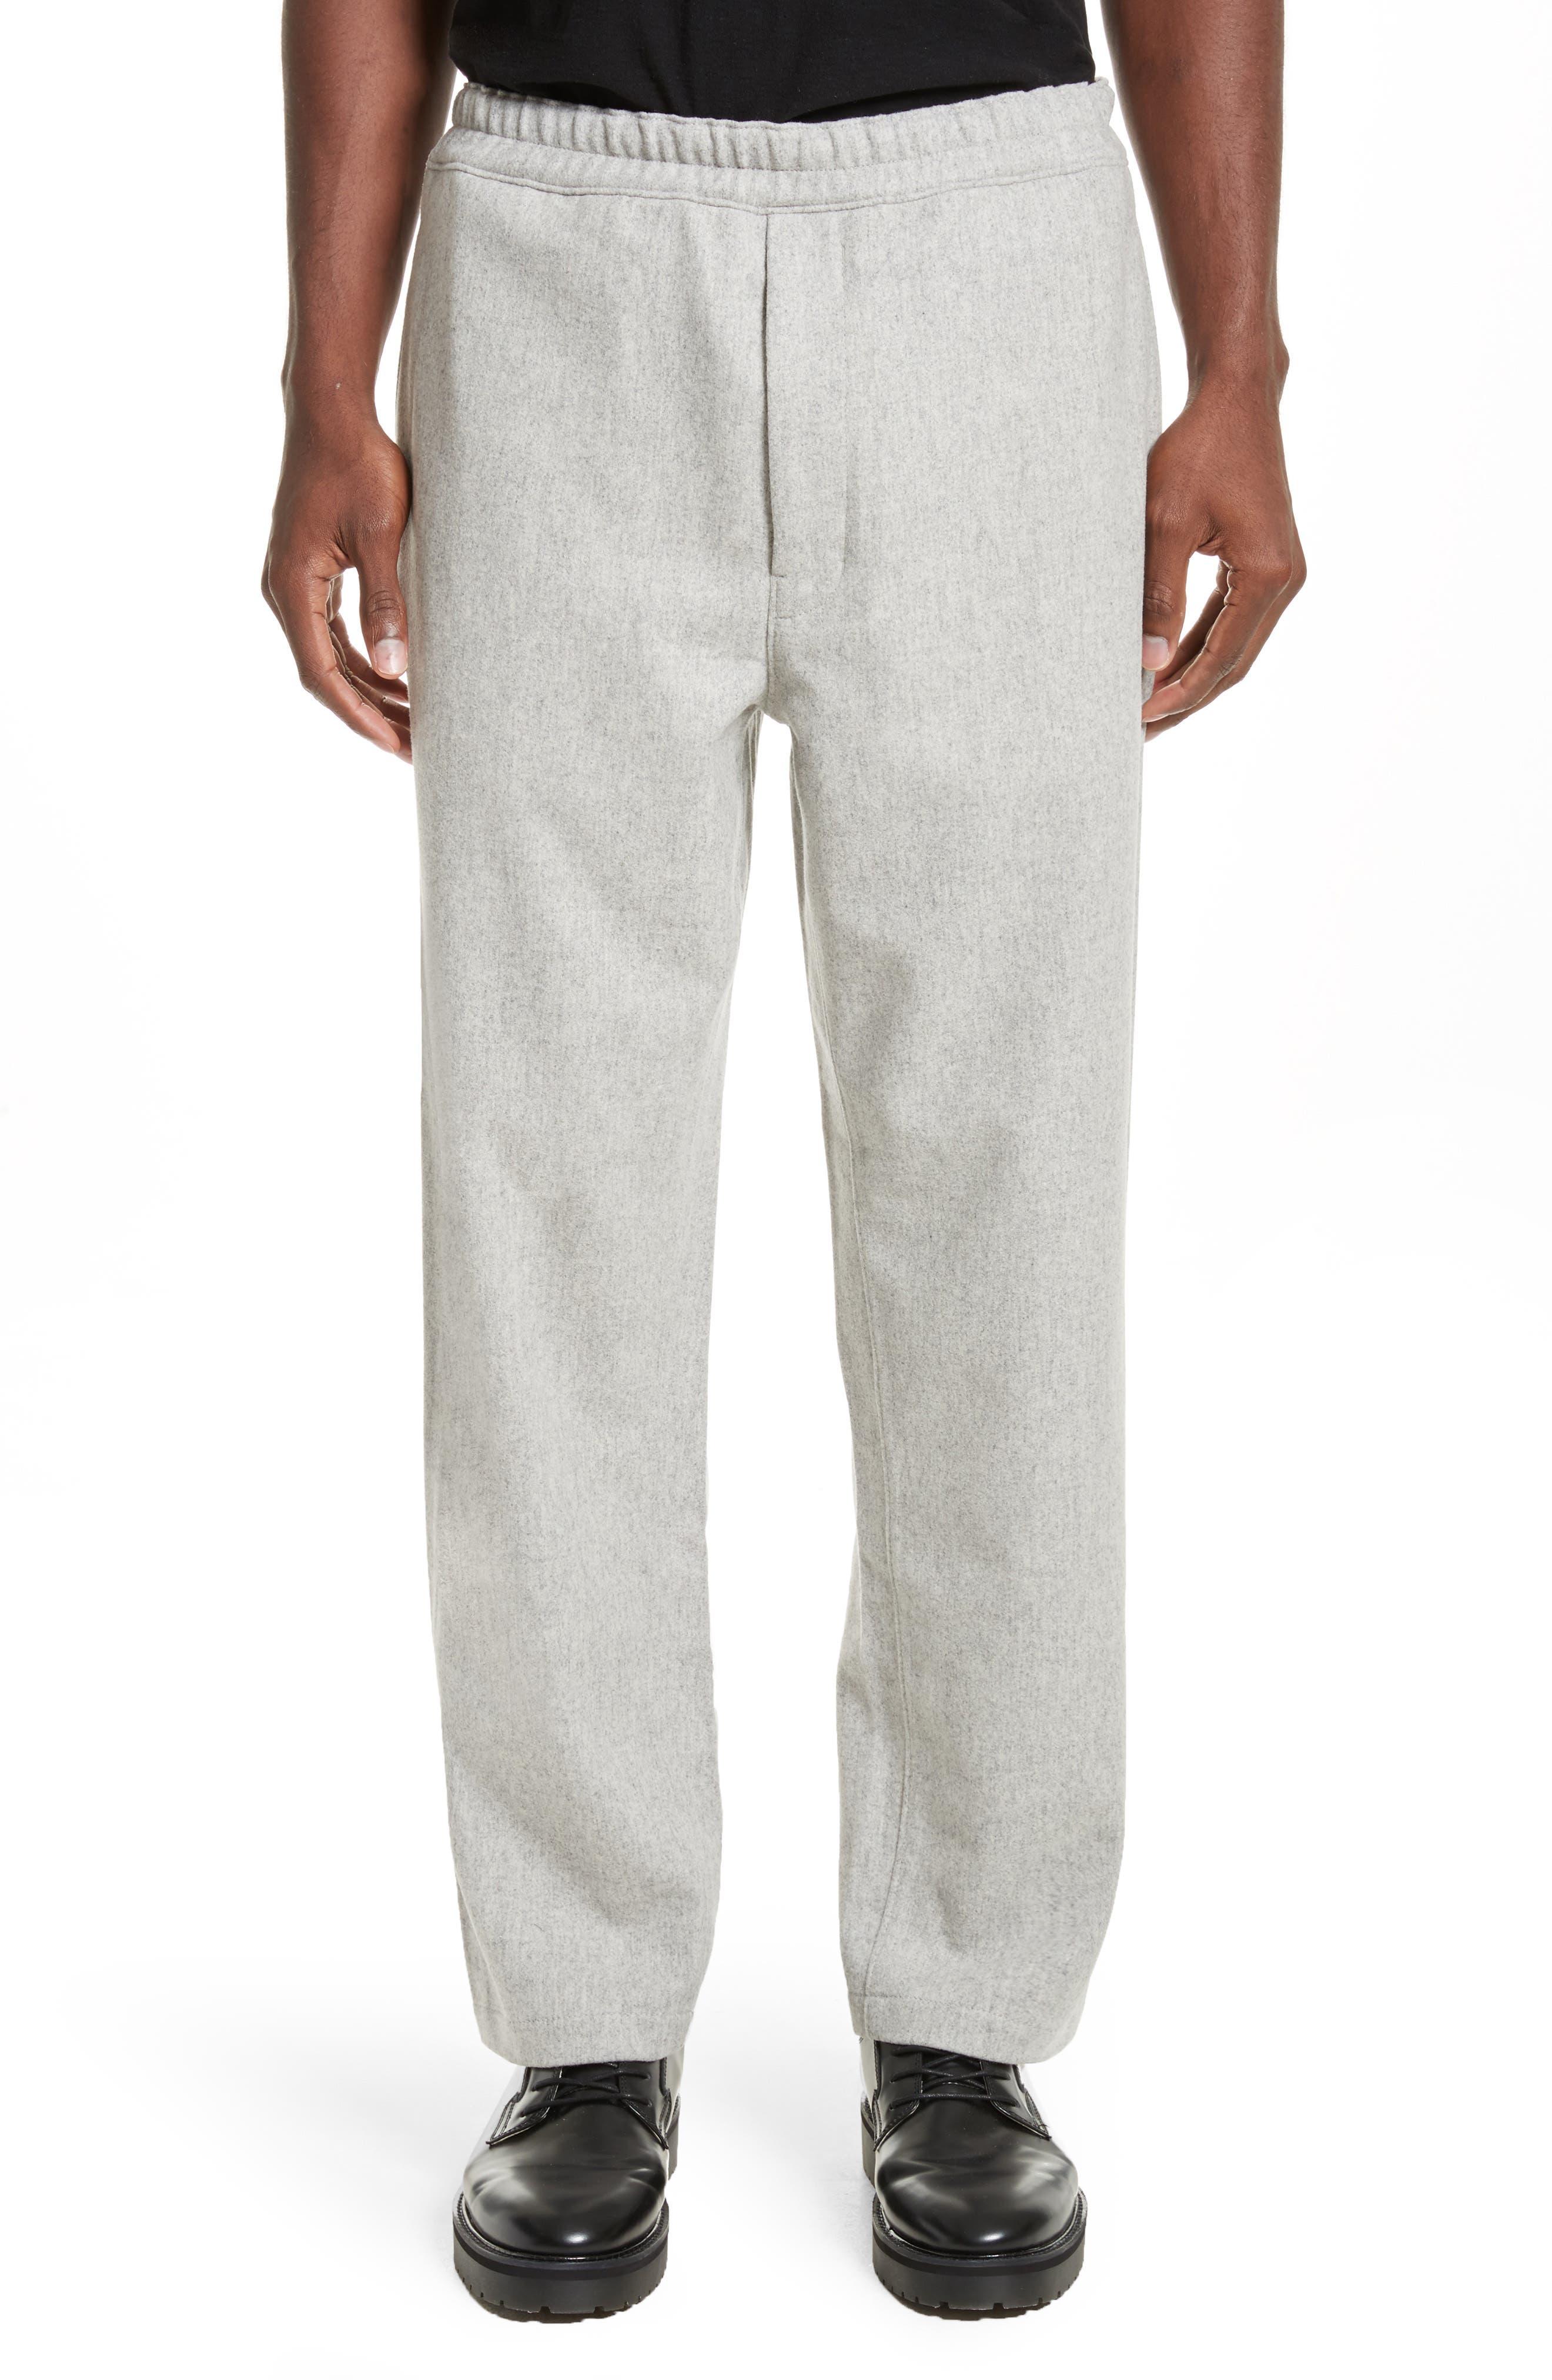 Mélange Wool Blend Trousers,                             Main thumbnail 1, color,                             Light Grey Melange